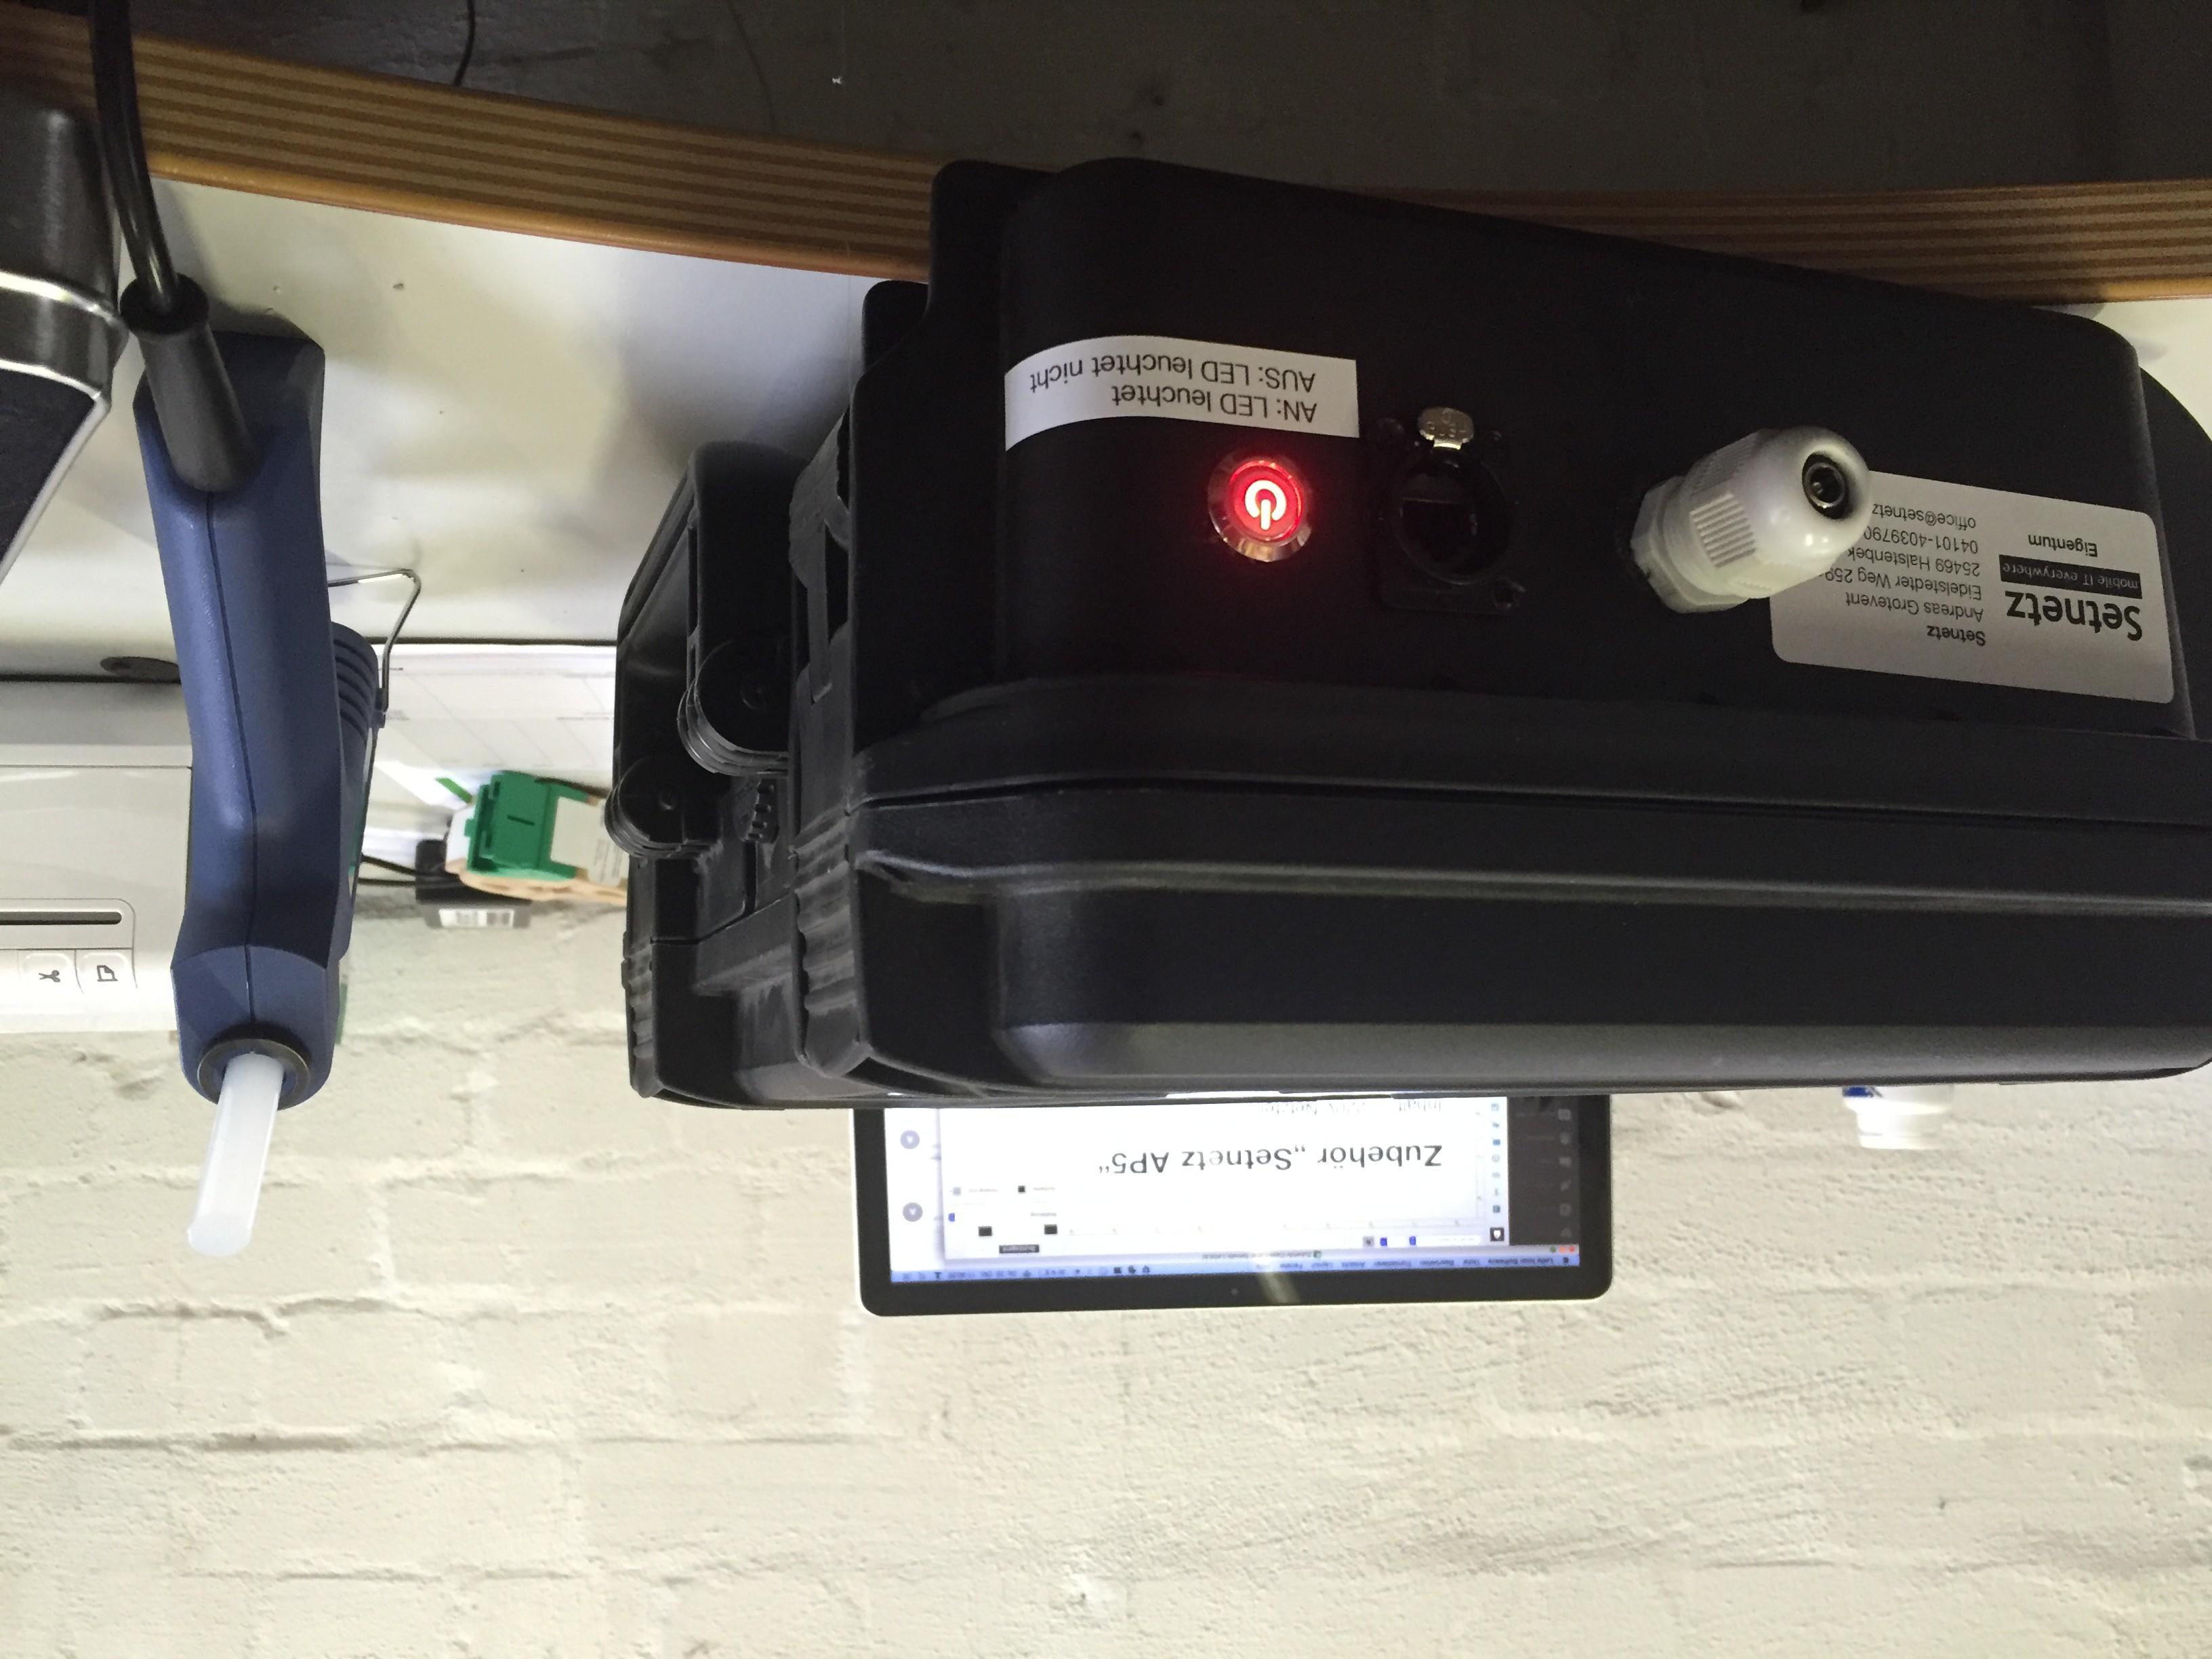 akku ab jetzt in dem ersten router case setnetz mobile set services. Black Bedroom Furniture Sets. Home Design Ideas